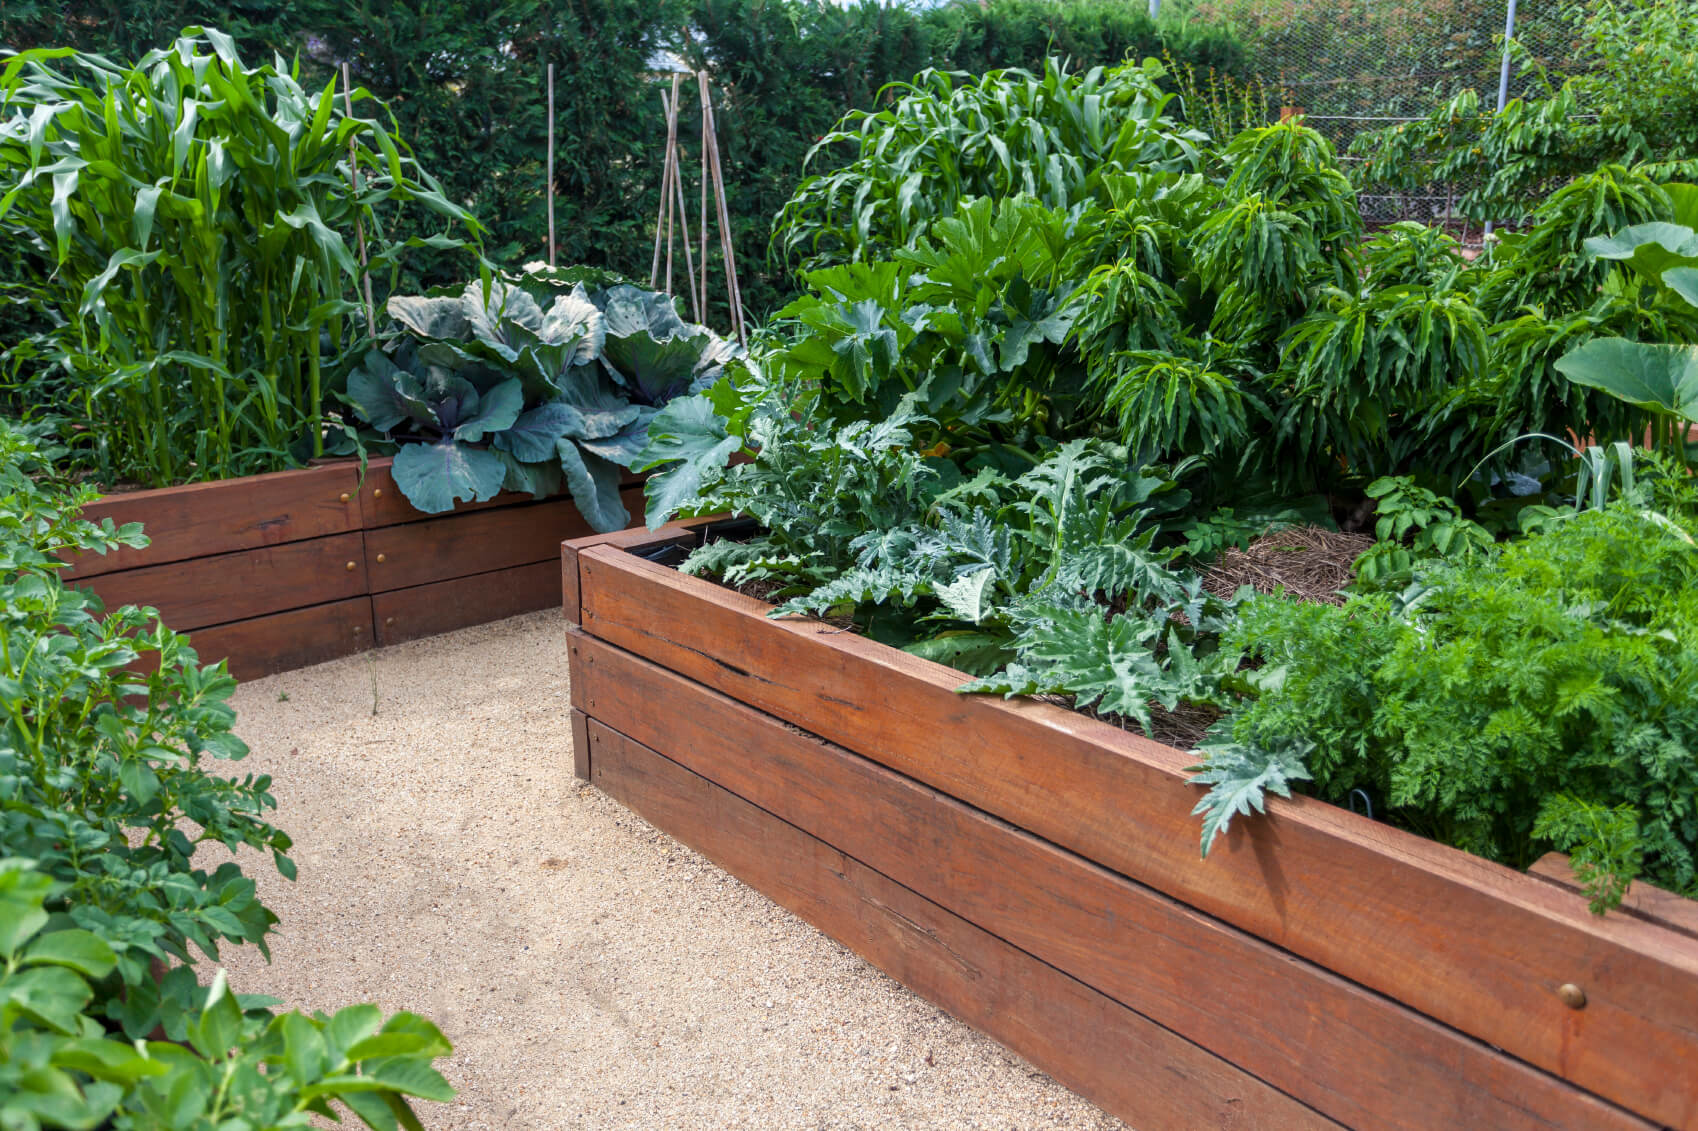 41 Backyard Raised Bed Garden Ideas on Raised Patio Designs  id=83112